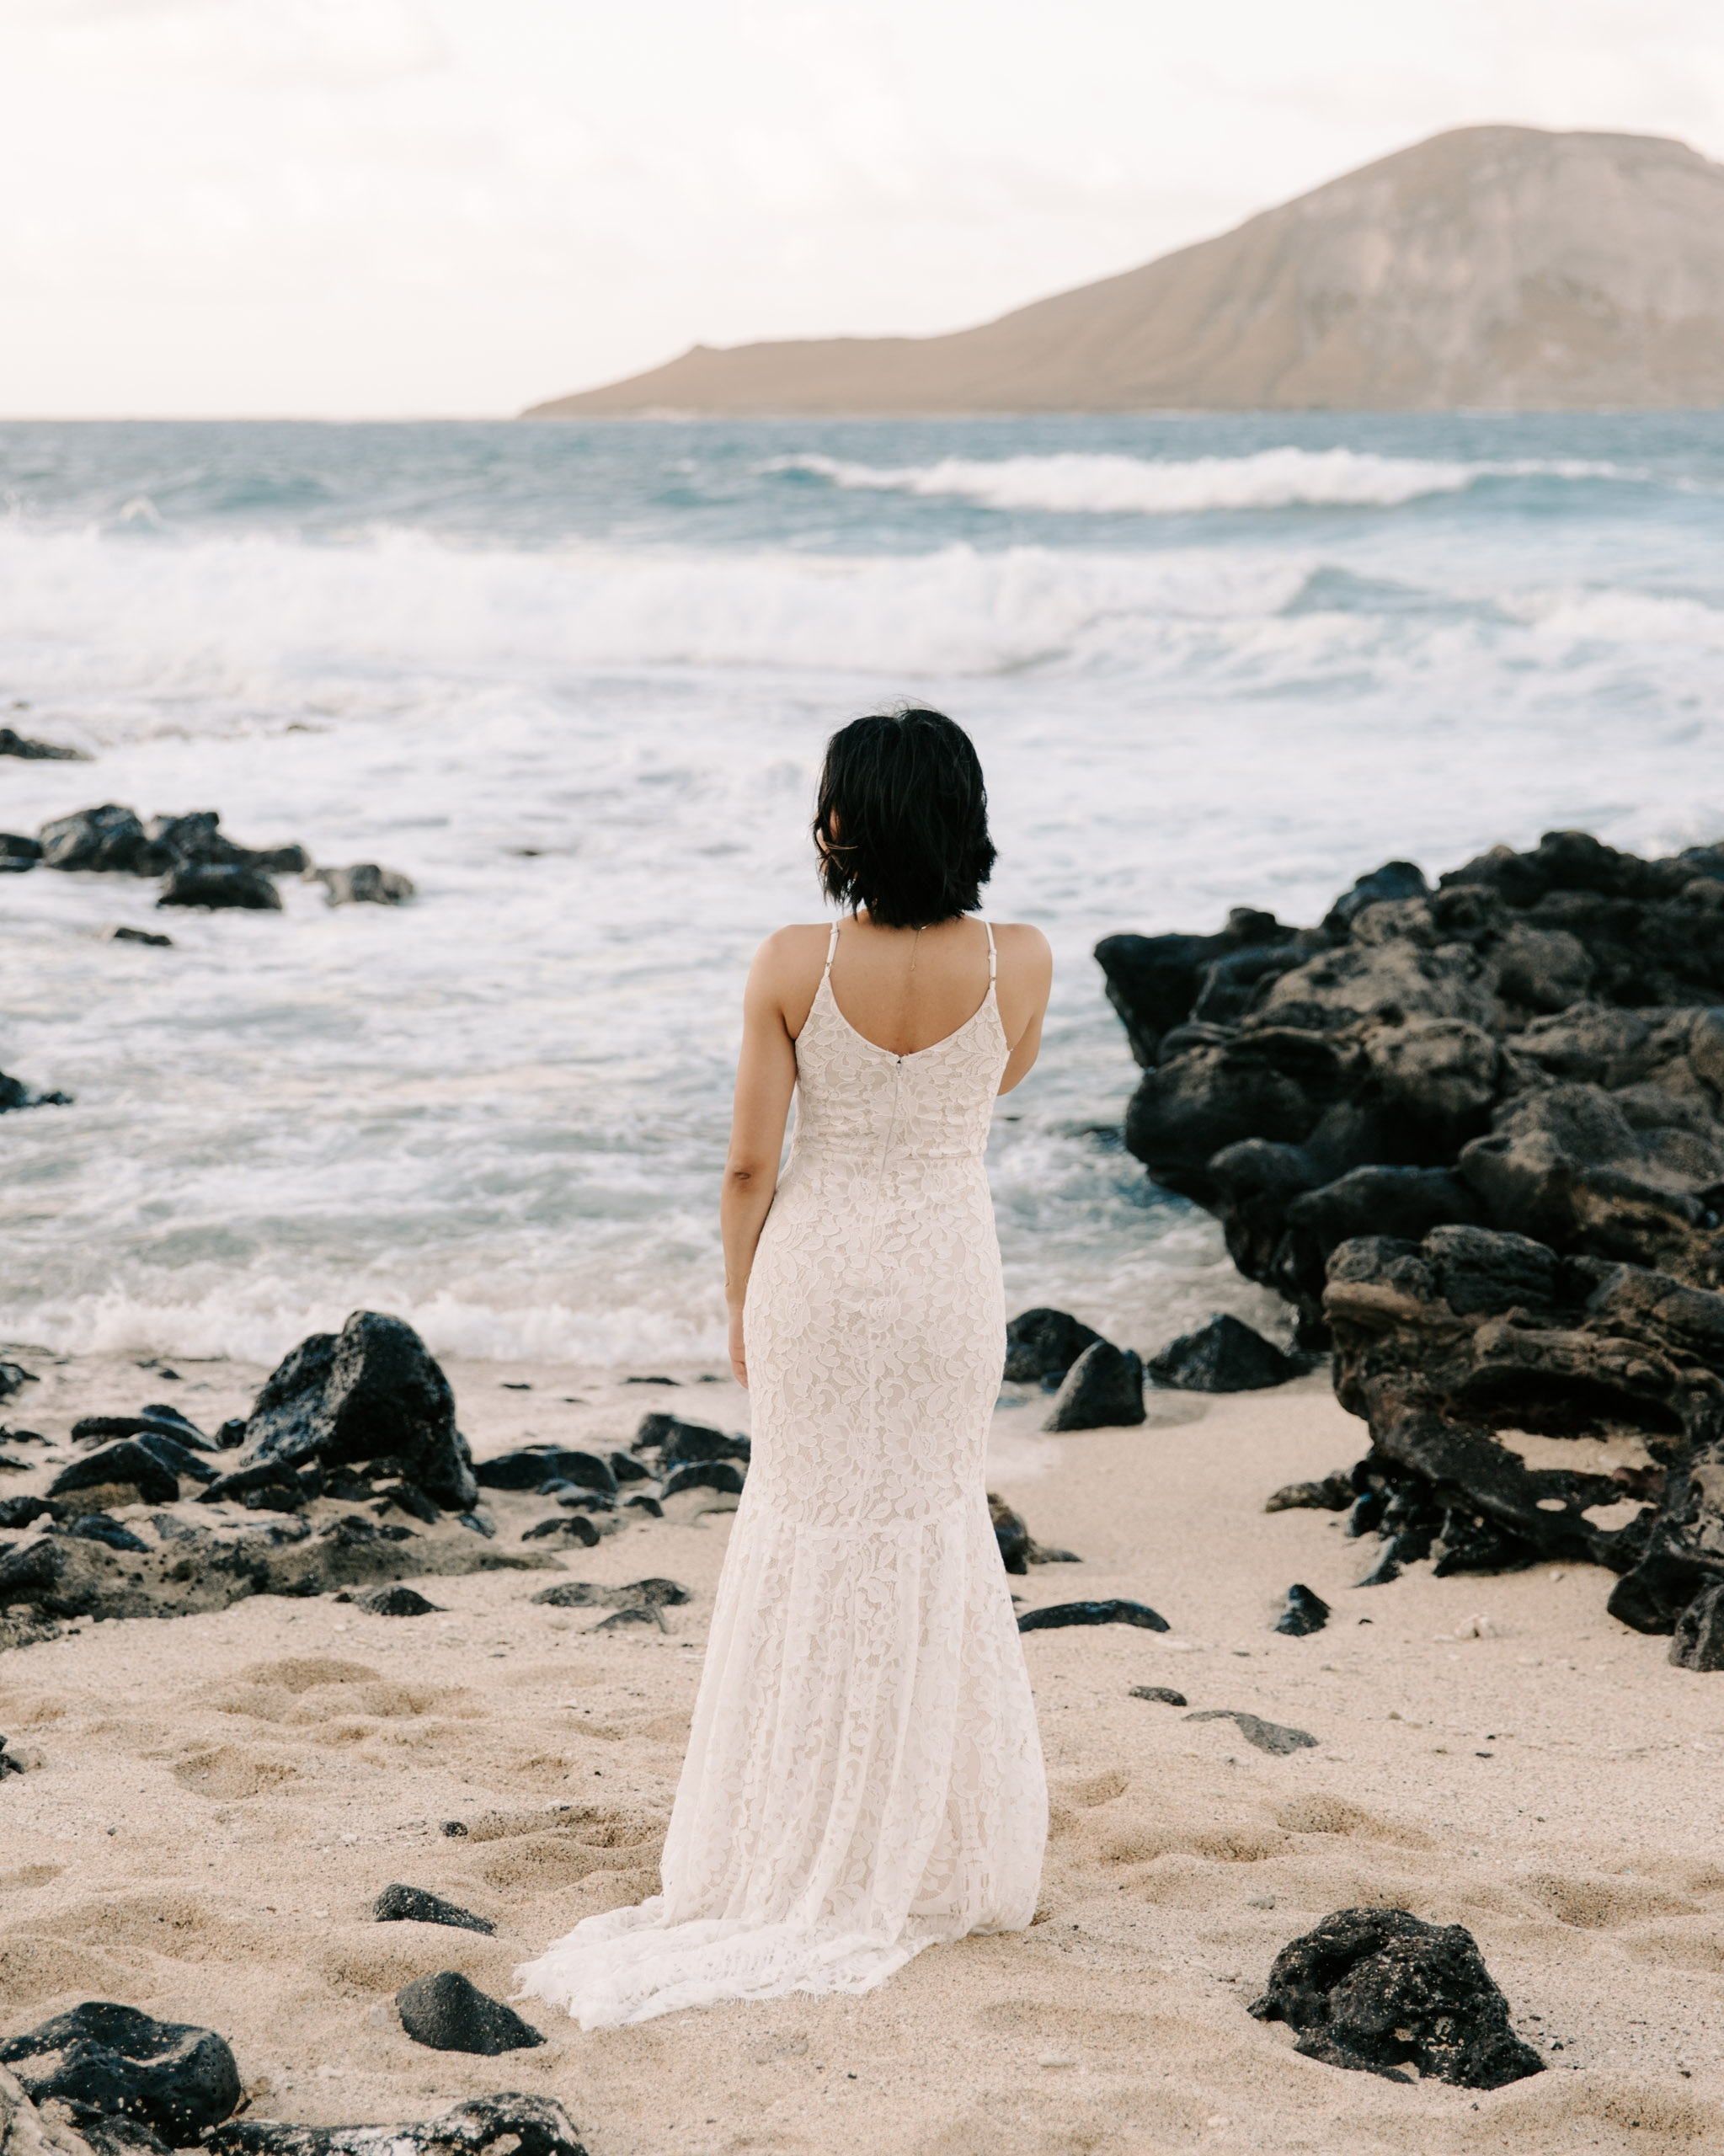 makapuu bridal portraits by hawaii elopement photographer Desiree Leilani